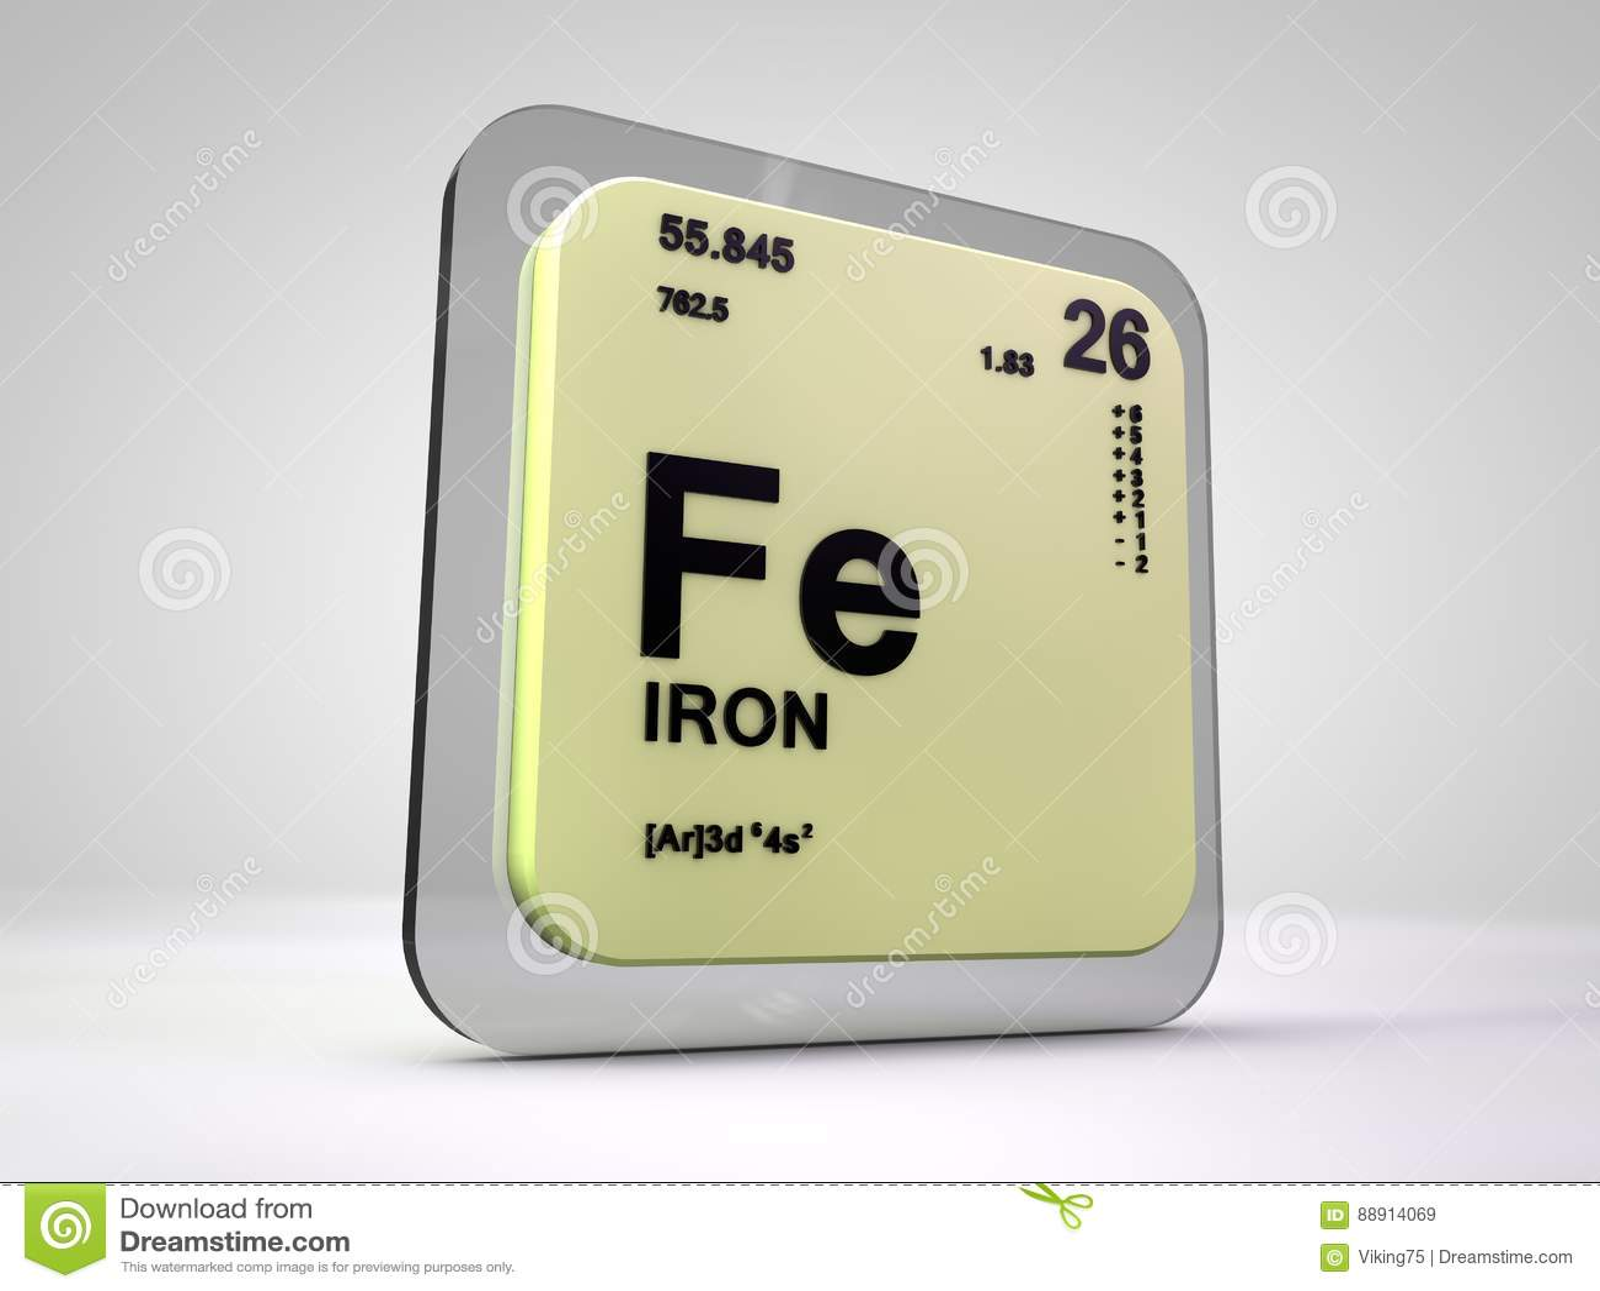 Hierro fe tabla peridica del elemento qumico stock de hierro fe tabla peridica del elemento qumico urtaz Images